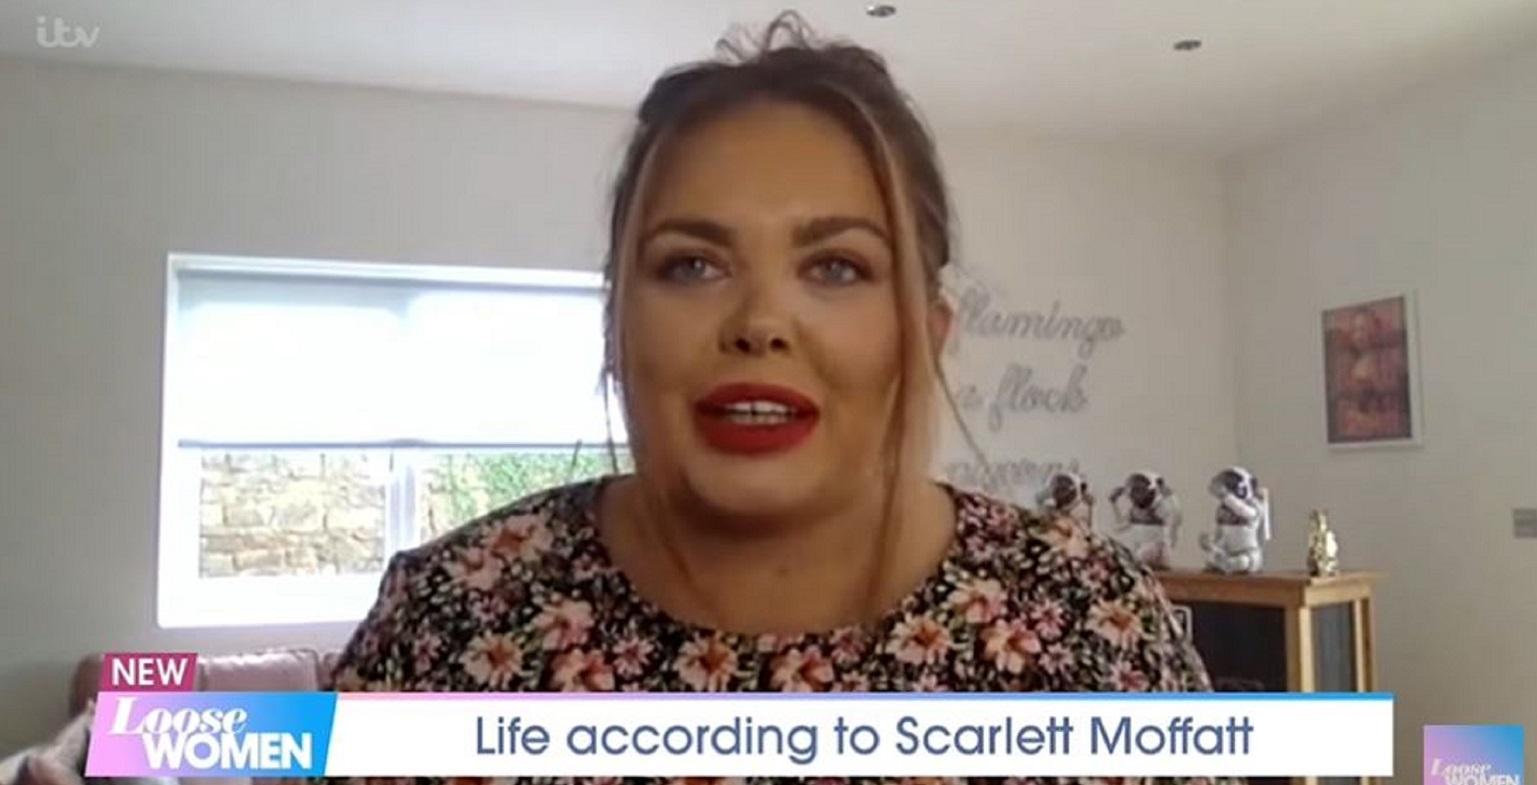 Scarlett Moffatt claims she was abducted by aliens in bizarre Loose Women interview